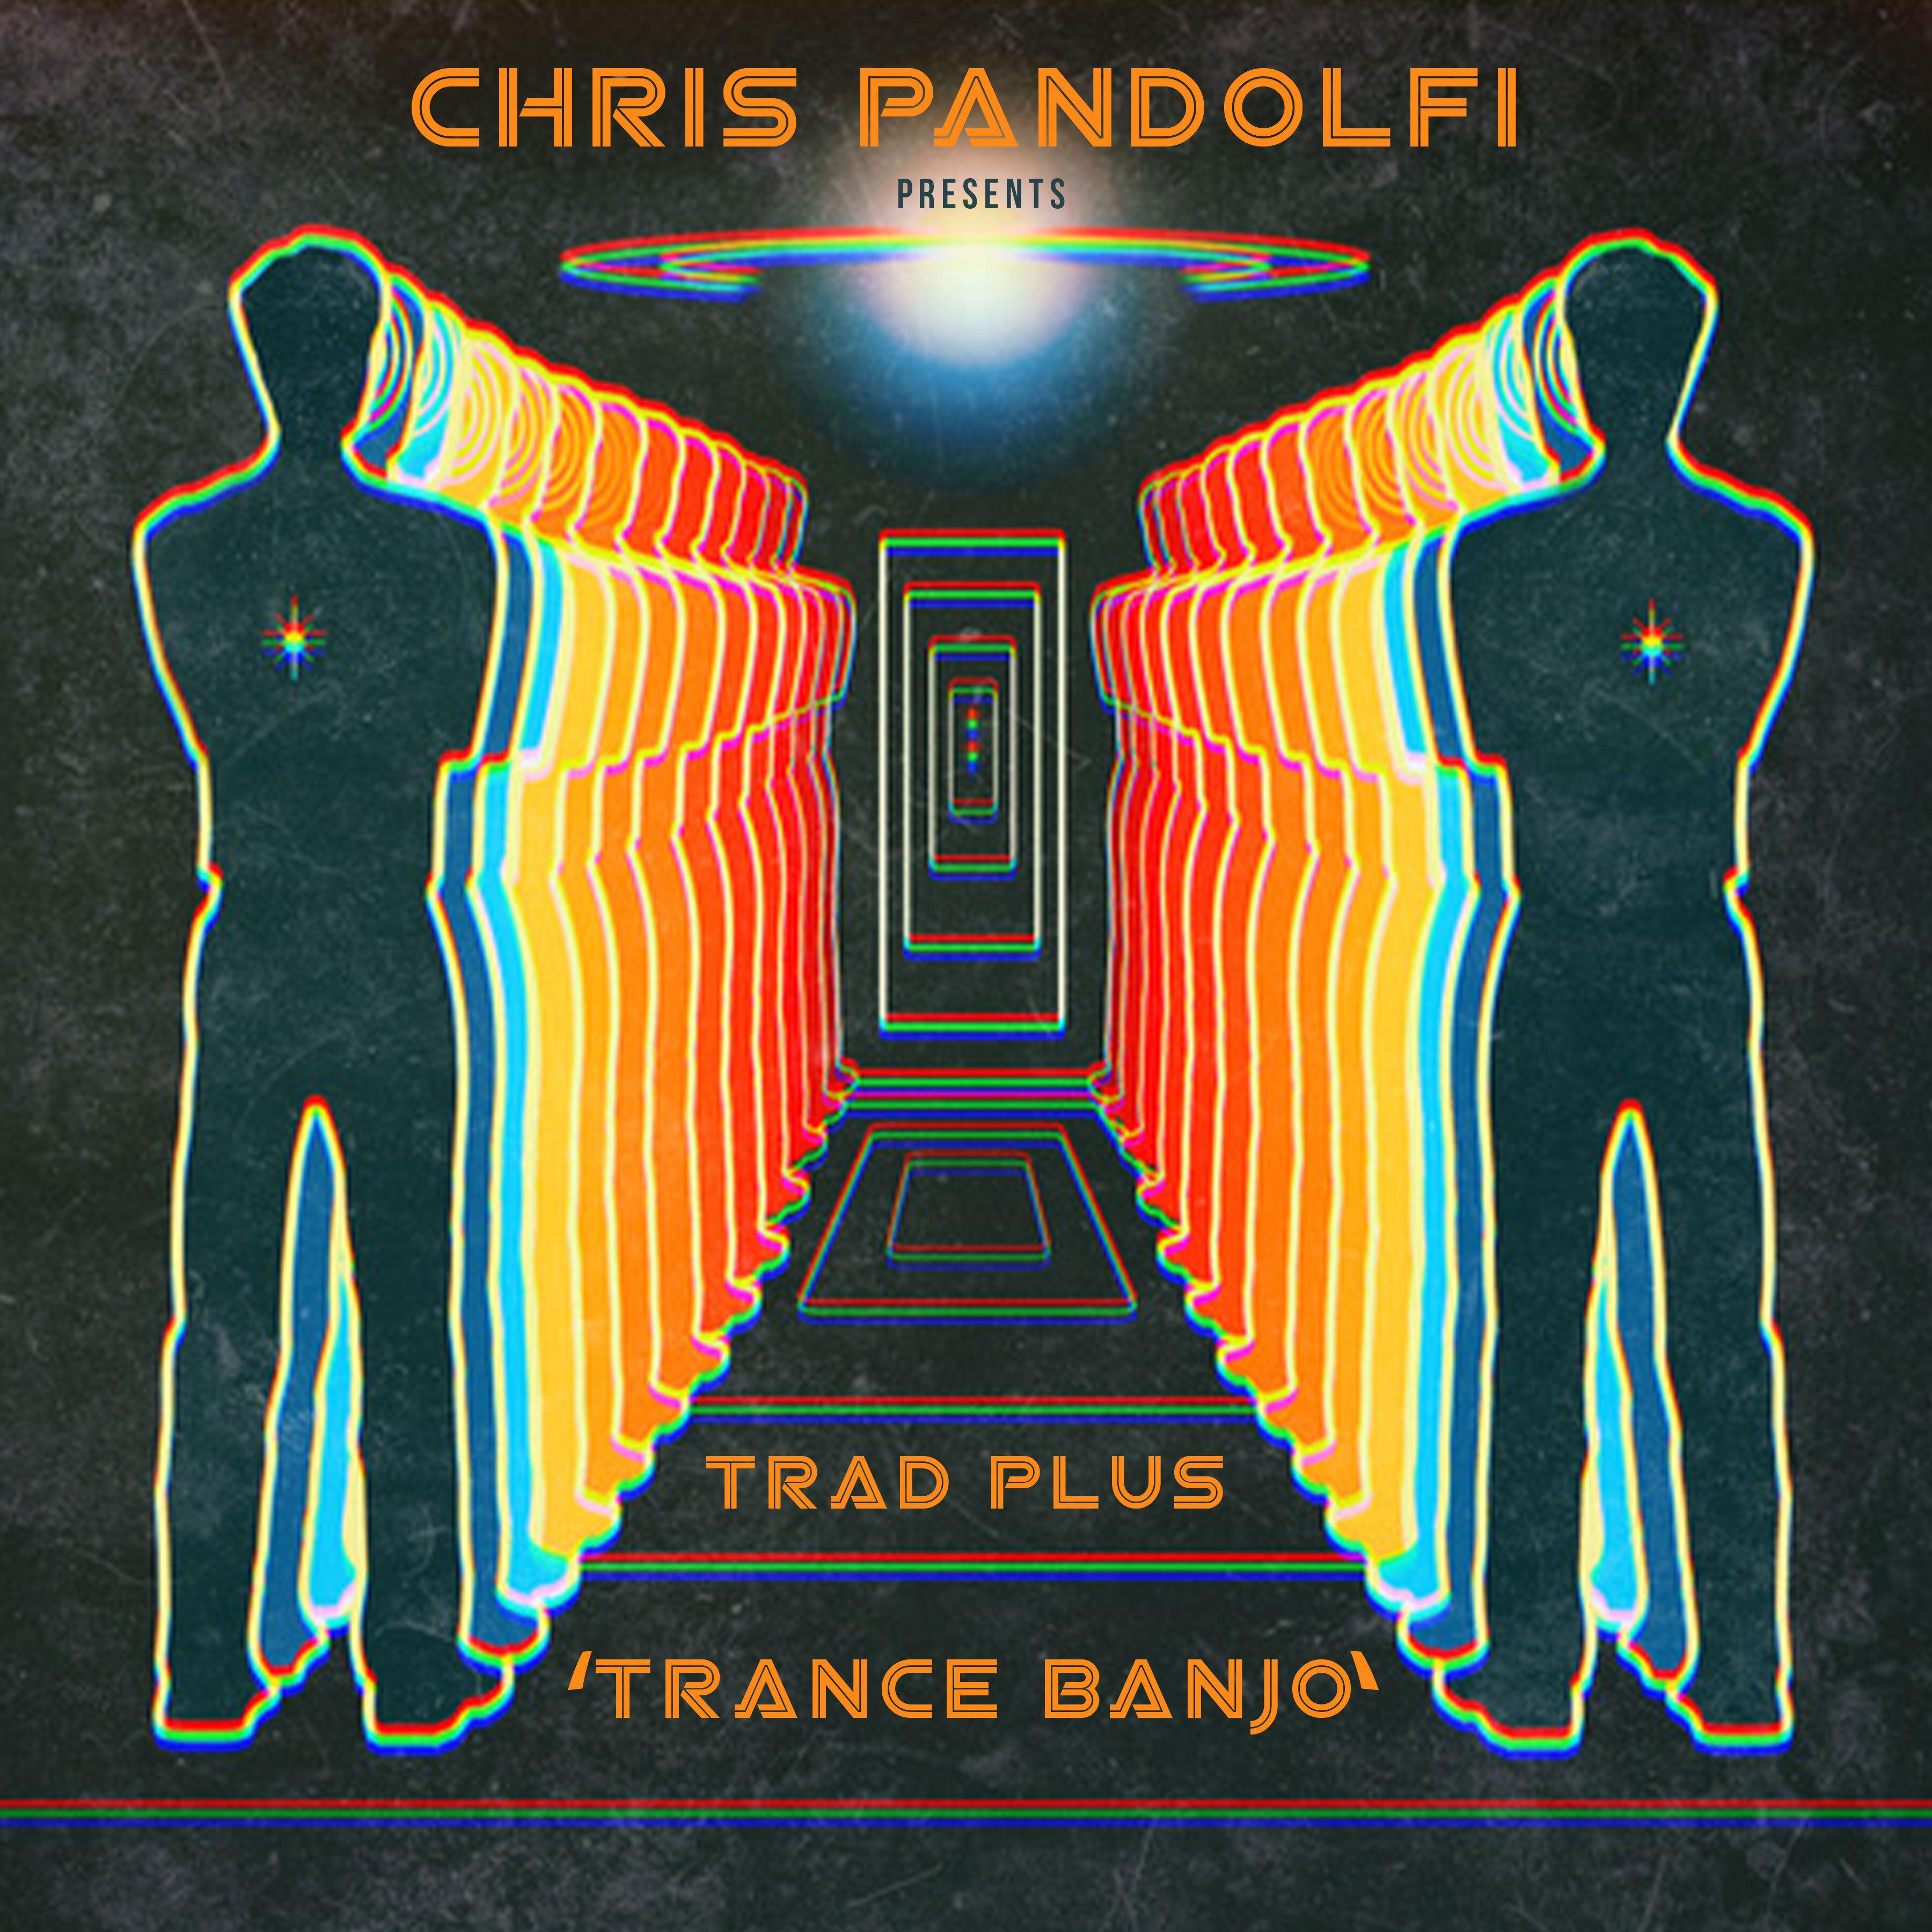 Trance Banjo Image